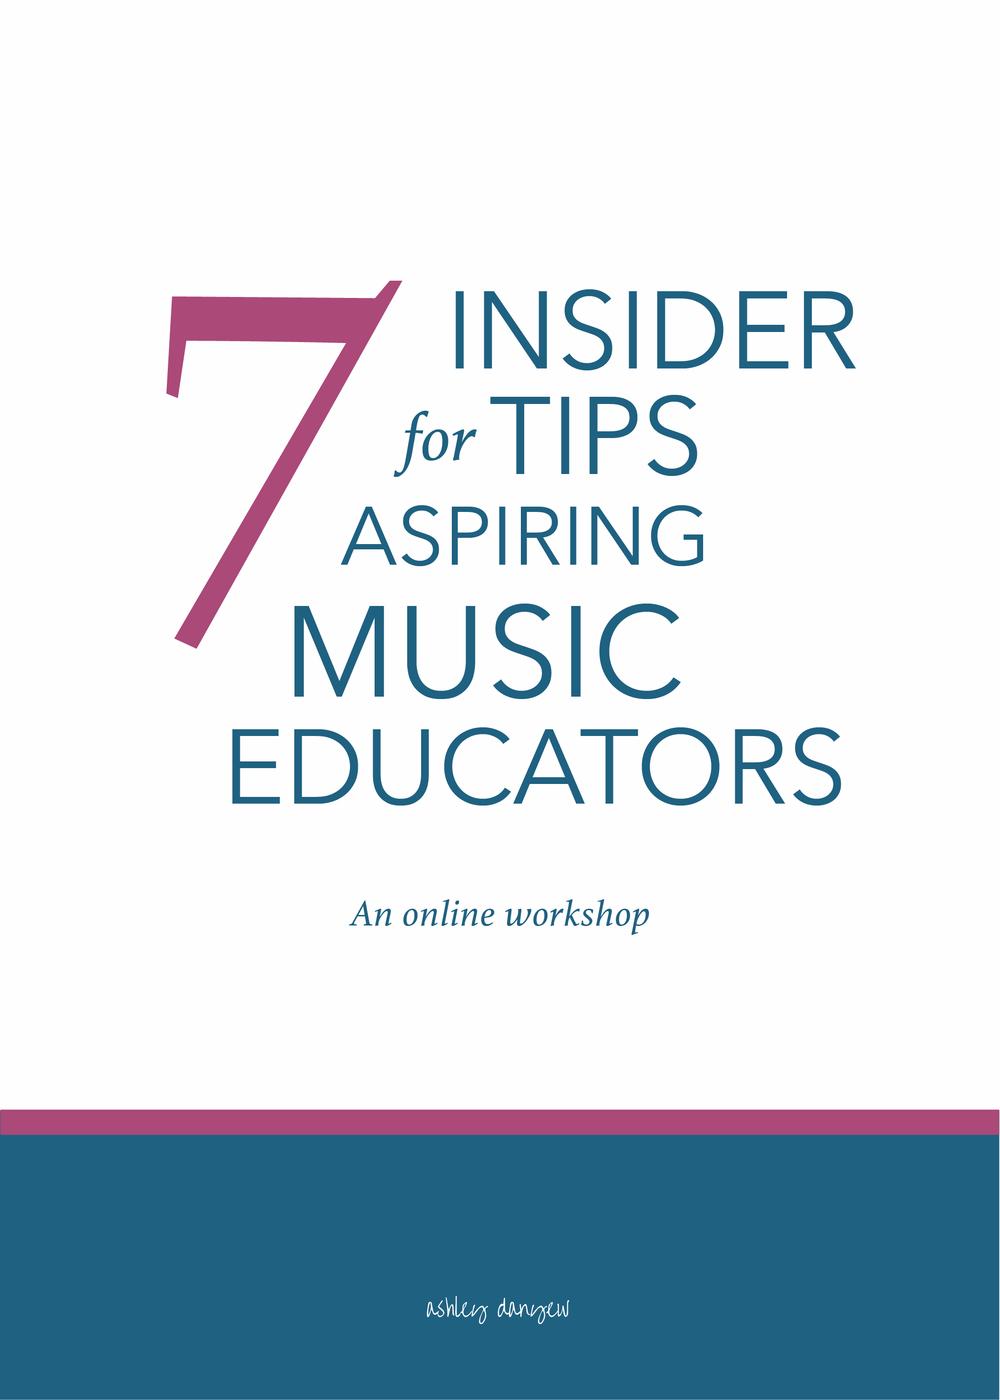 7 Insider Tips for Aspiring Music Educators-60.png